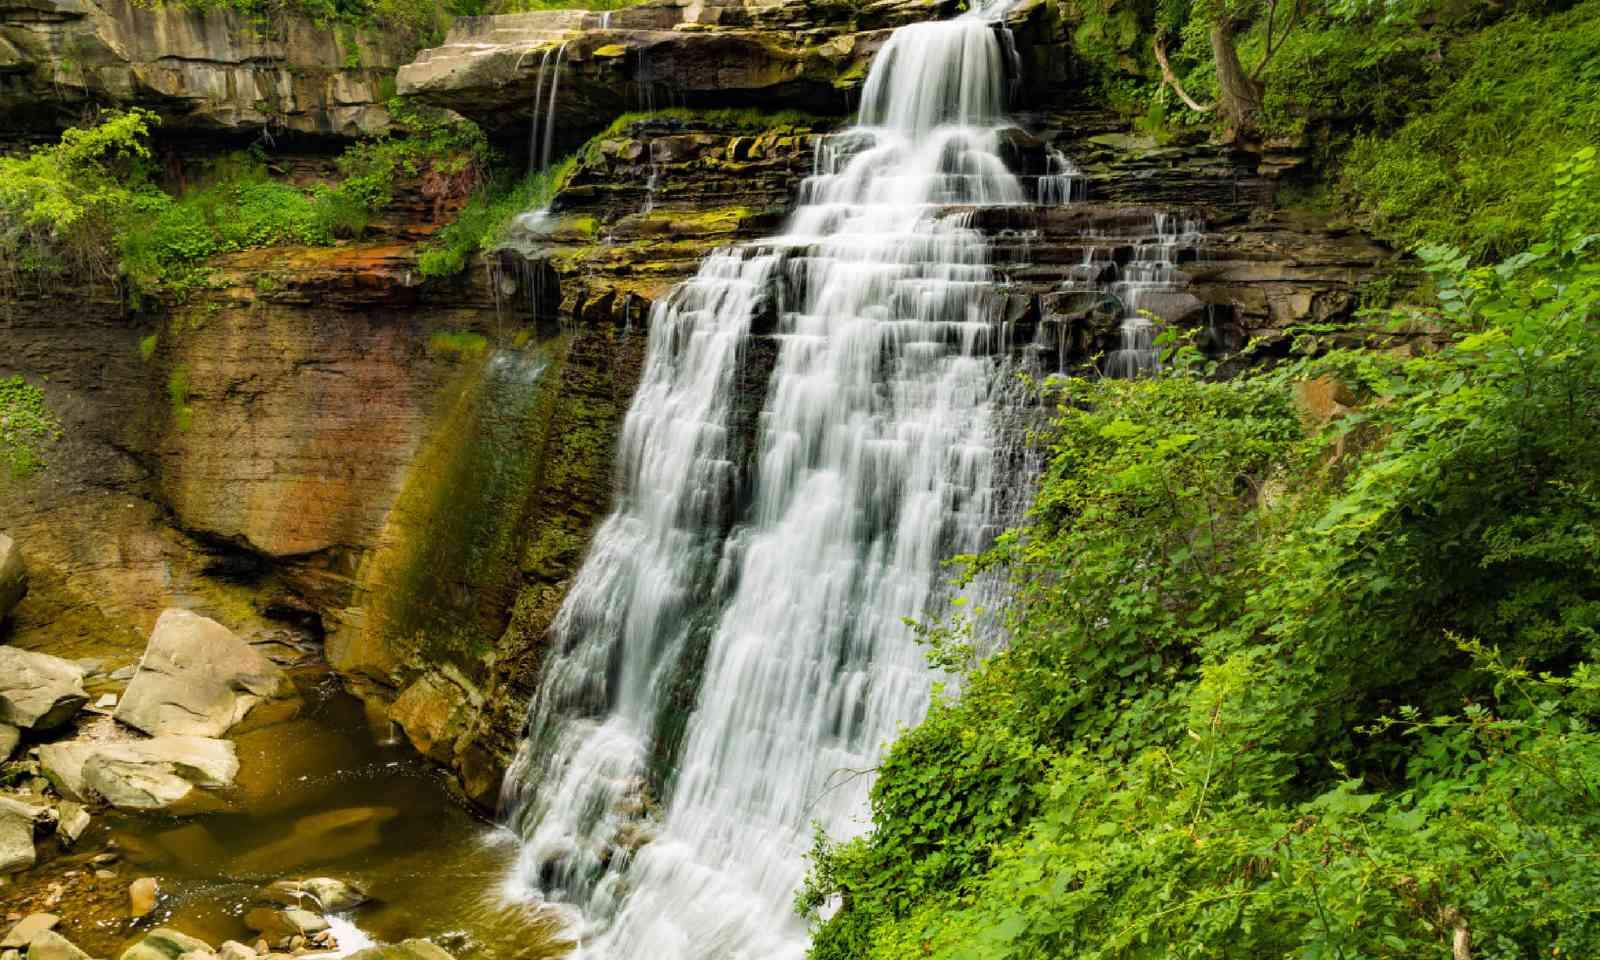 Brandywine Falls in Cuyahoga National Park (Shutterstock)